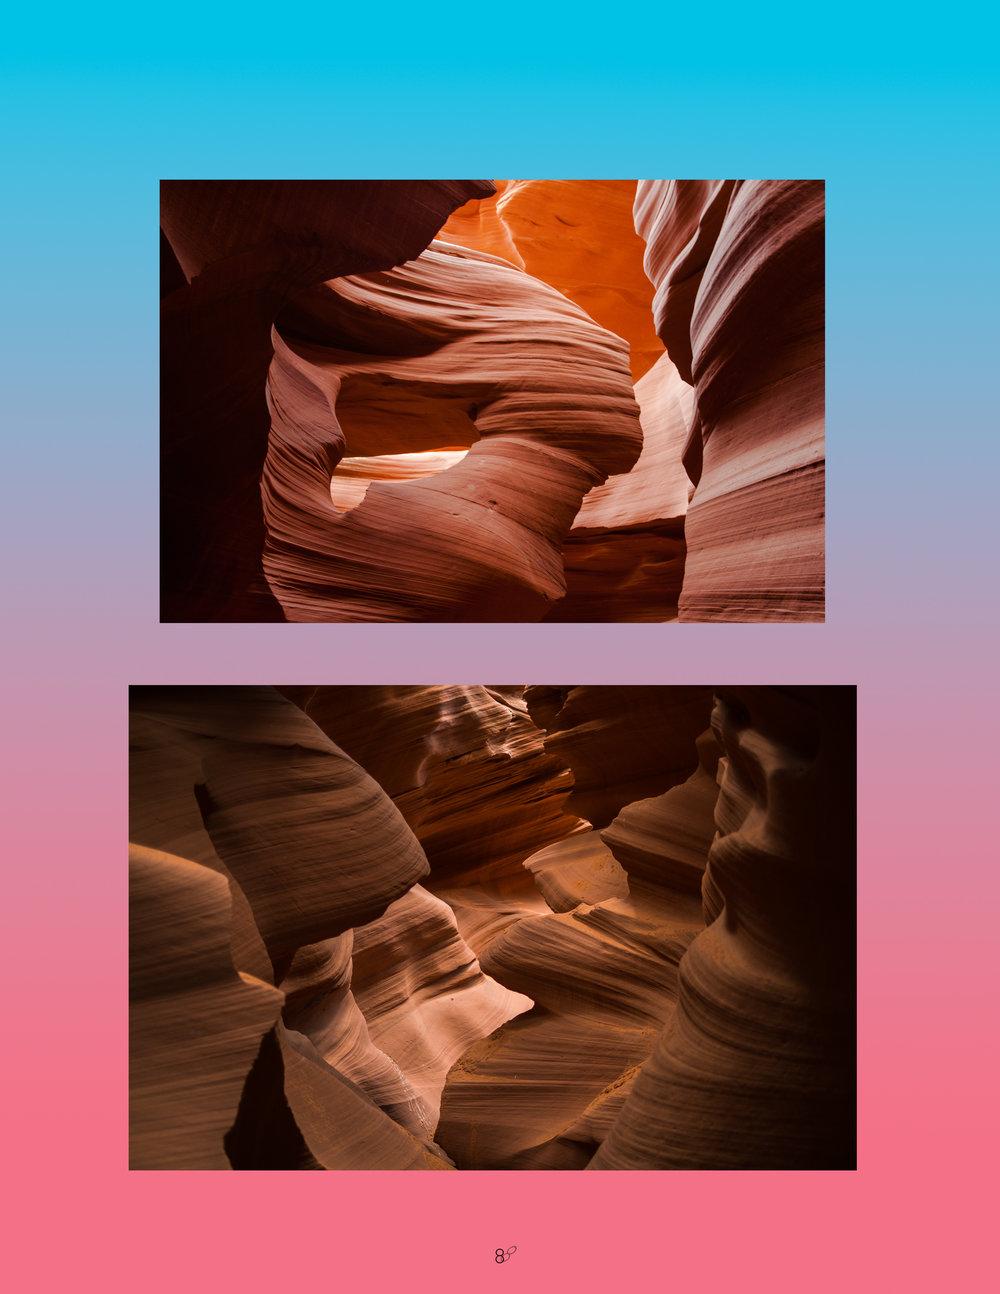 desert sweetheart page 8.jpg